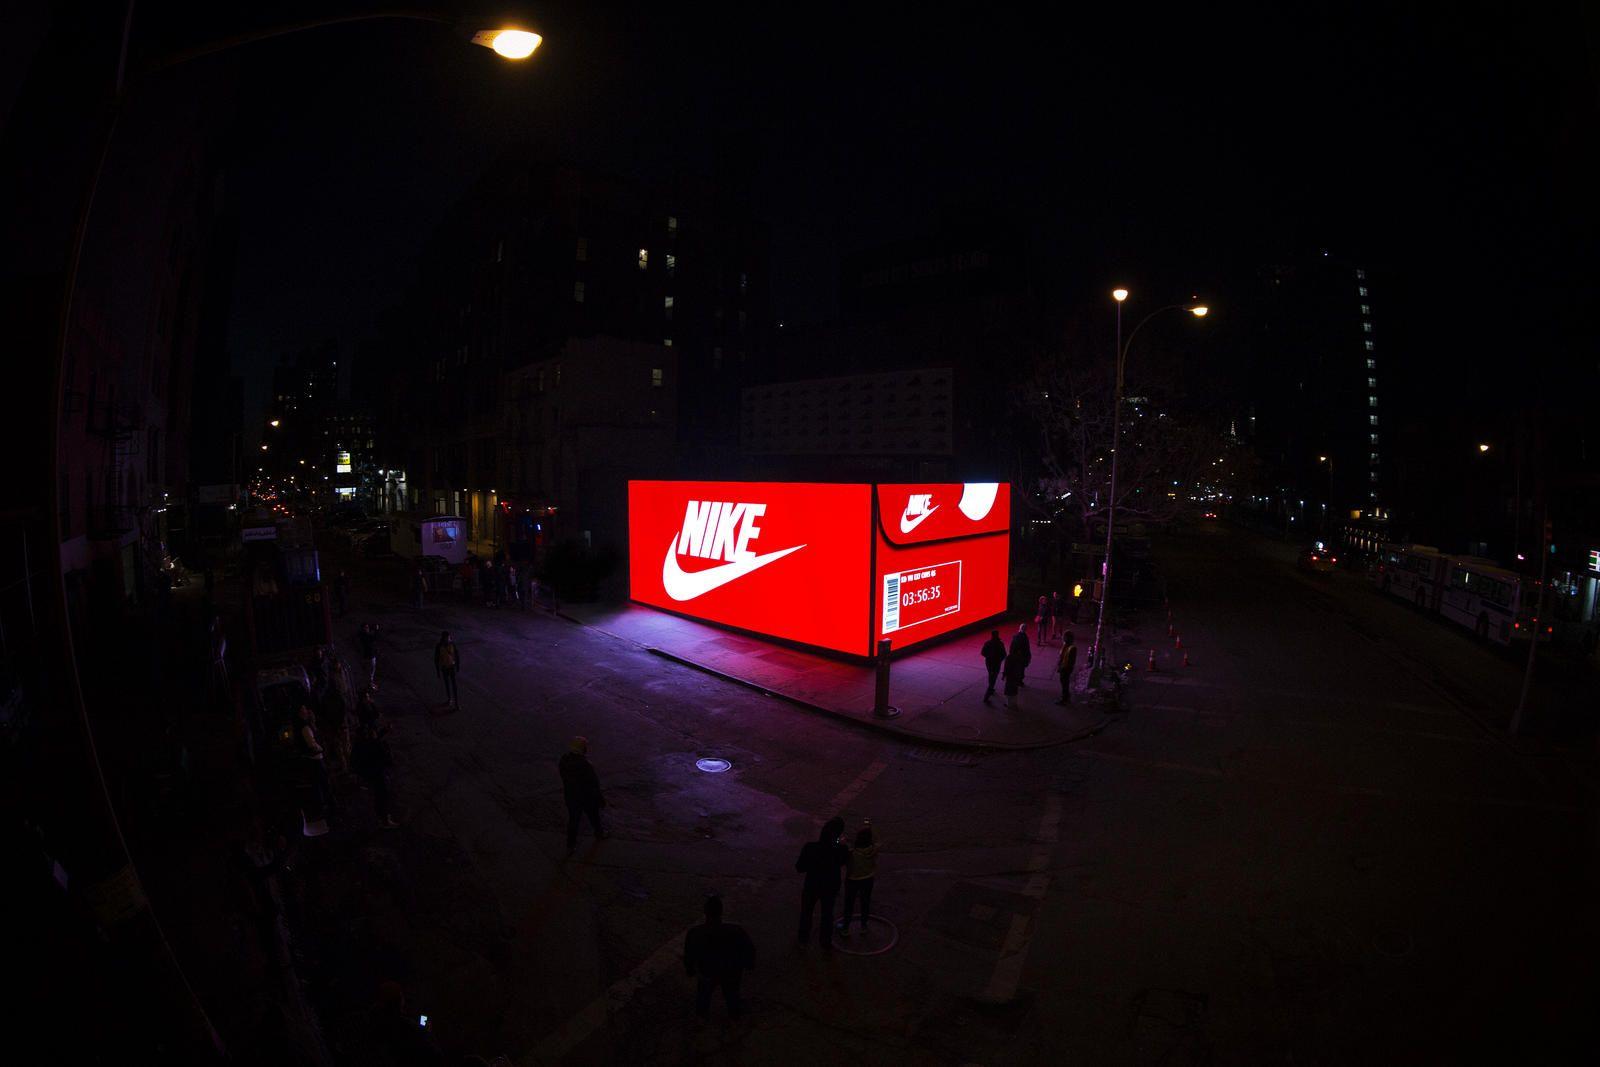 Nike snkrs app delivers onestop shop for coveted footwear